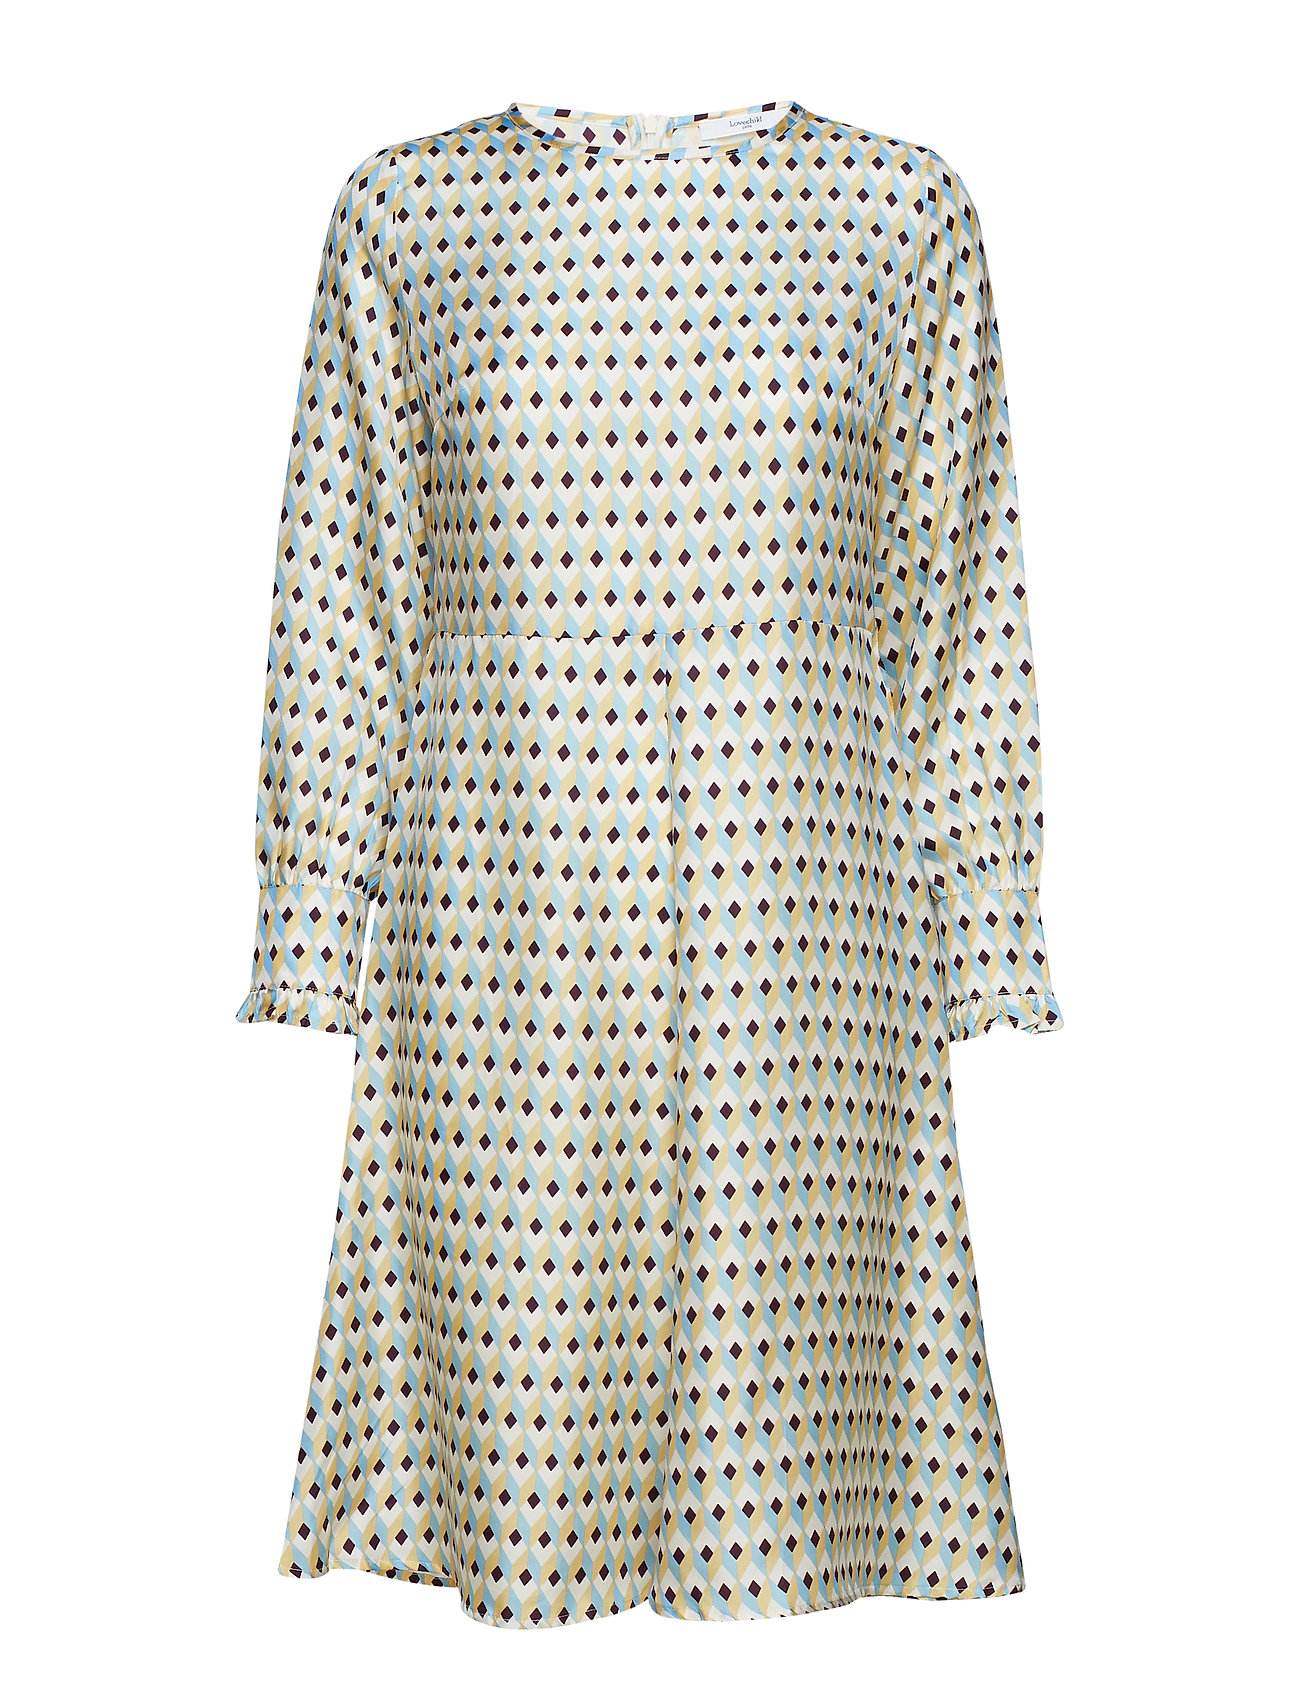 Lovechild 1979 Gaia dress - IMPALA